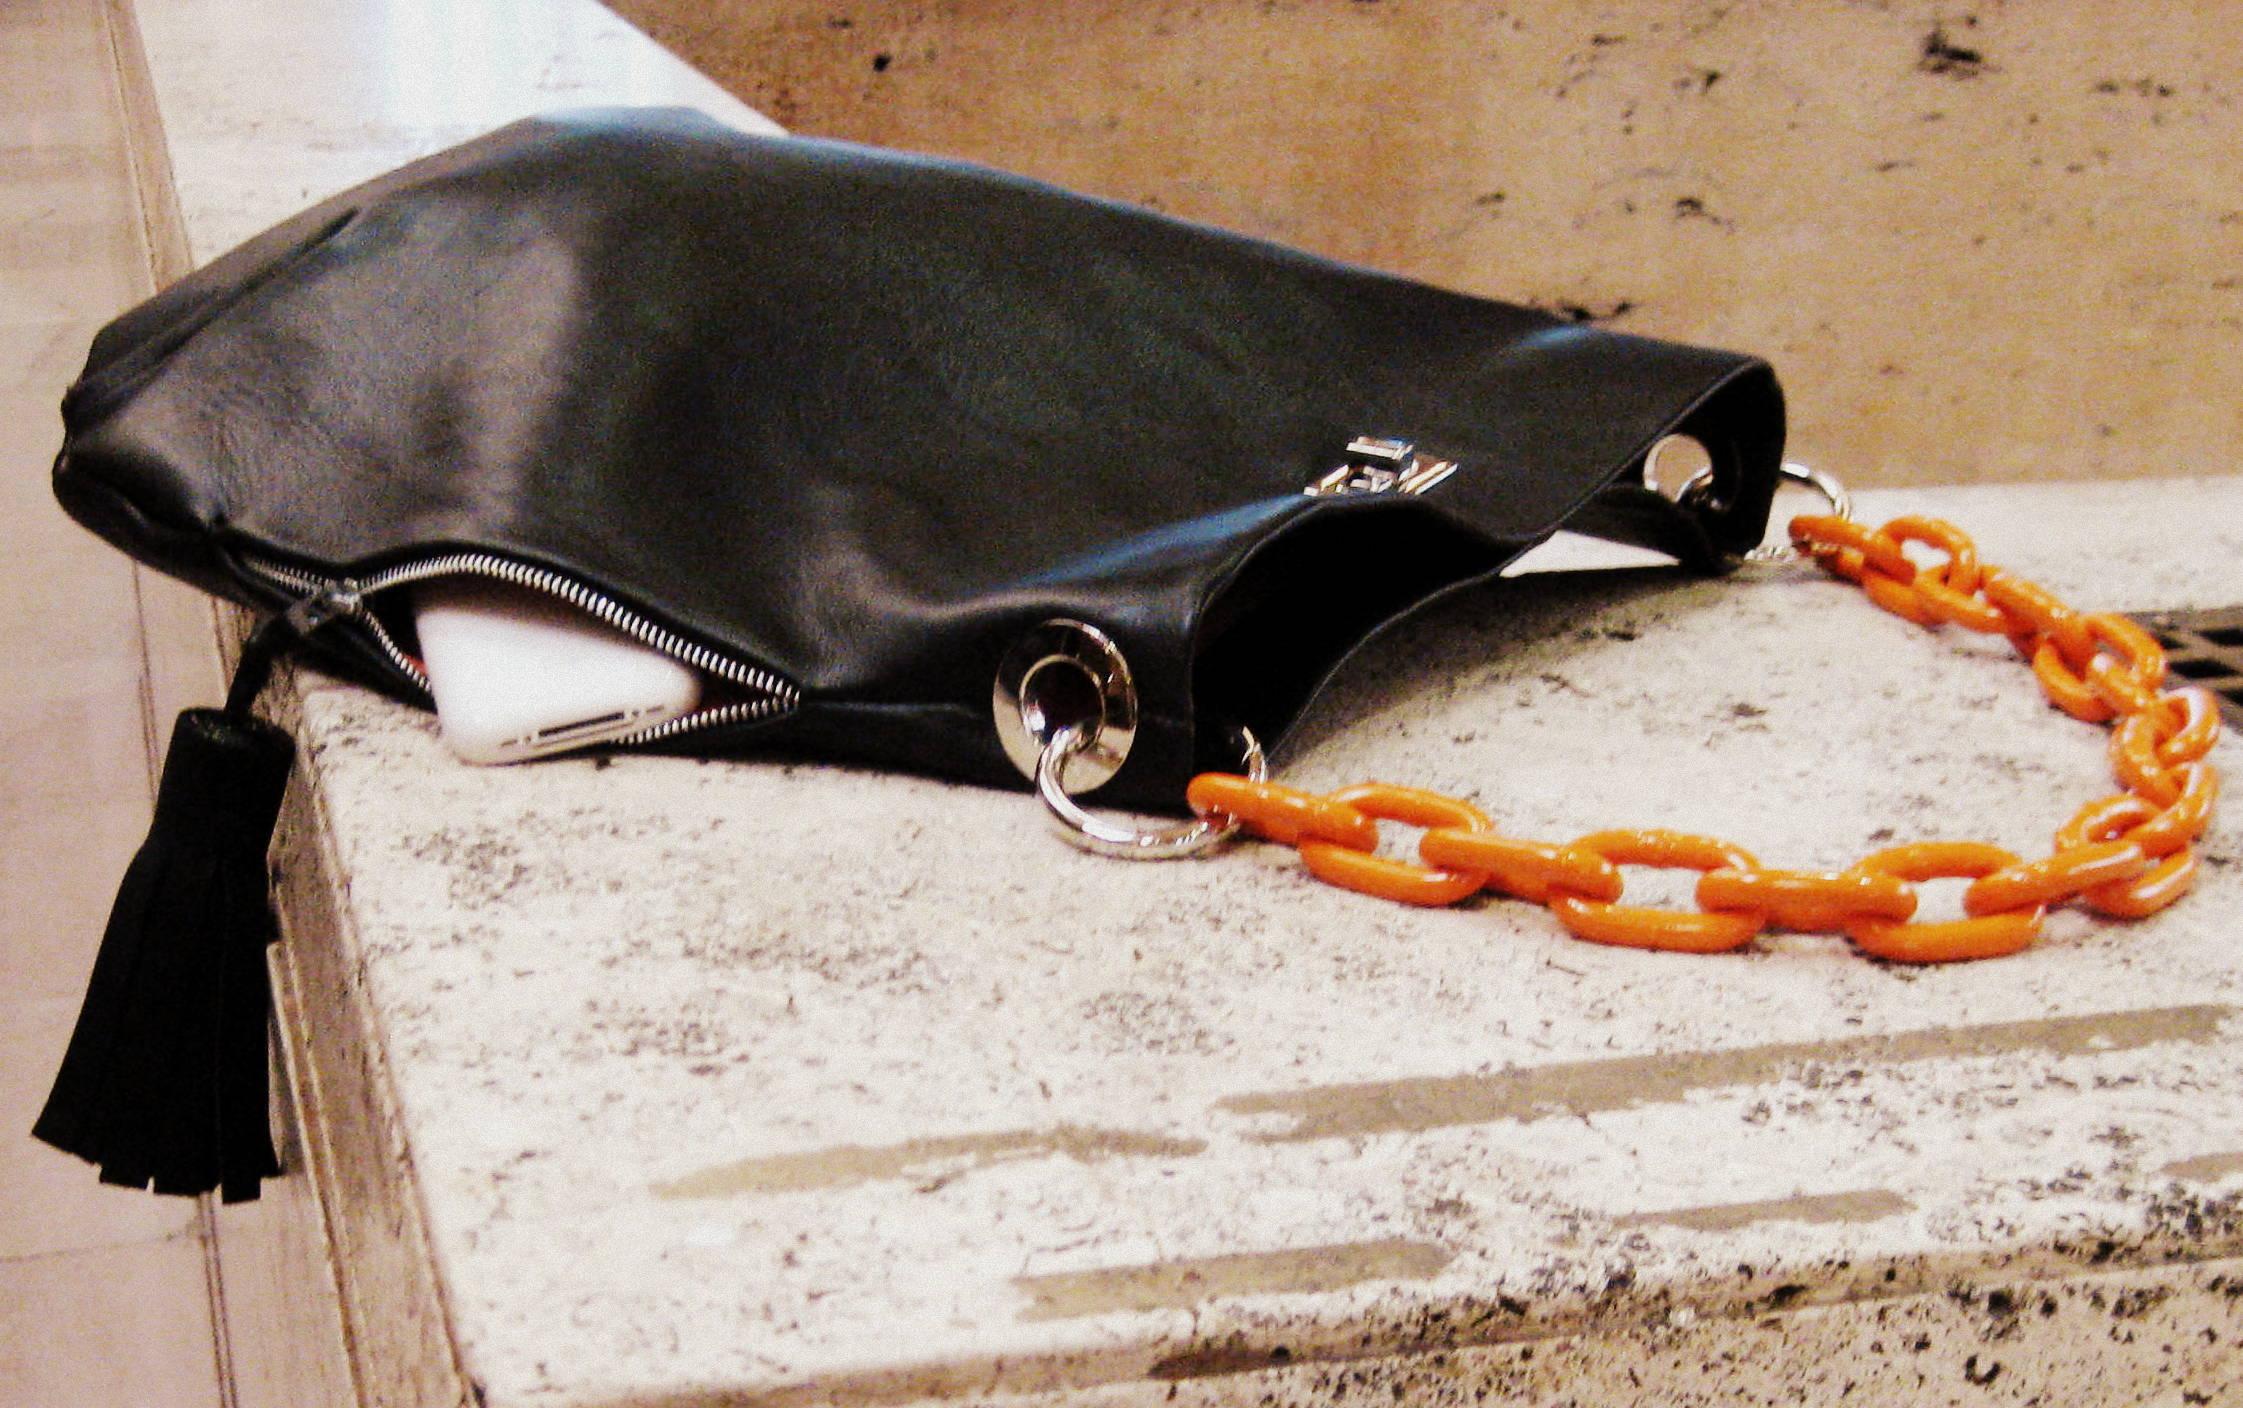 c HARDWEAR Chain Hobo with phone conrad booker collection IMG_4555 b - Copy.JPG